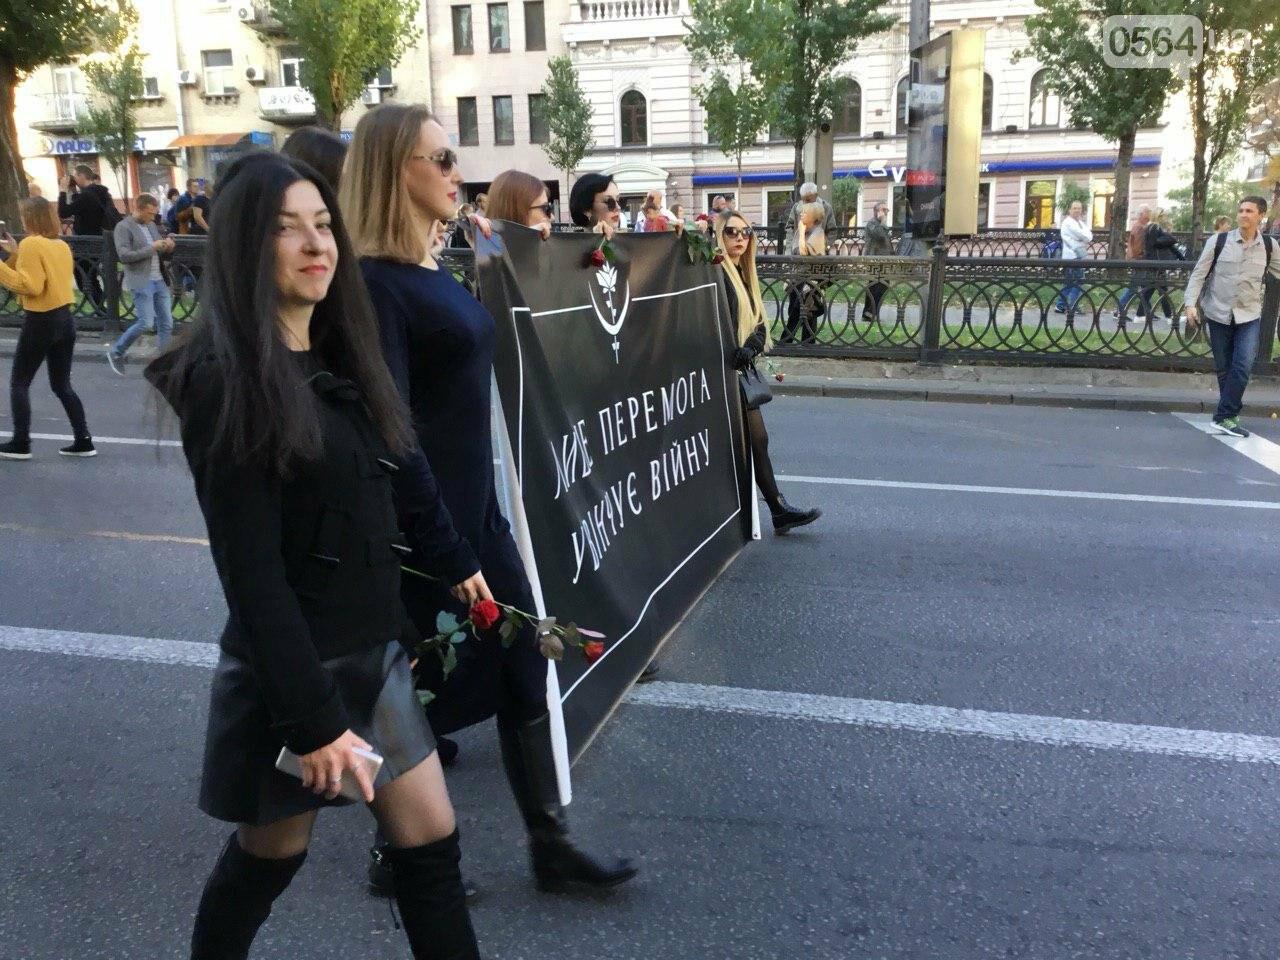 Криворожане поддержали Марш сопротивления капитуляции в Киеве, - ФОТО, ВИДЕО, ОБНОВЛЕНО, фото-14